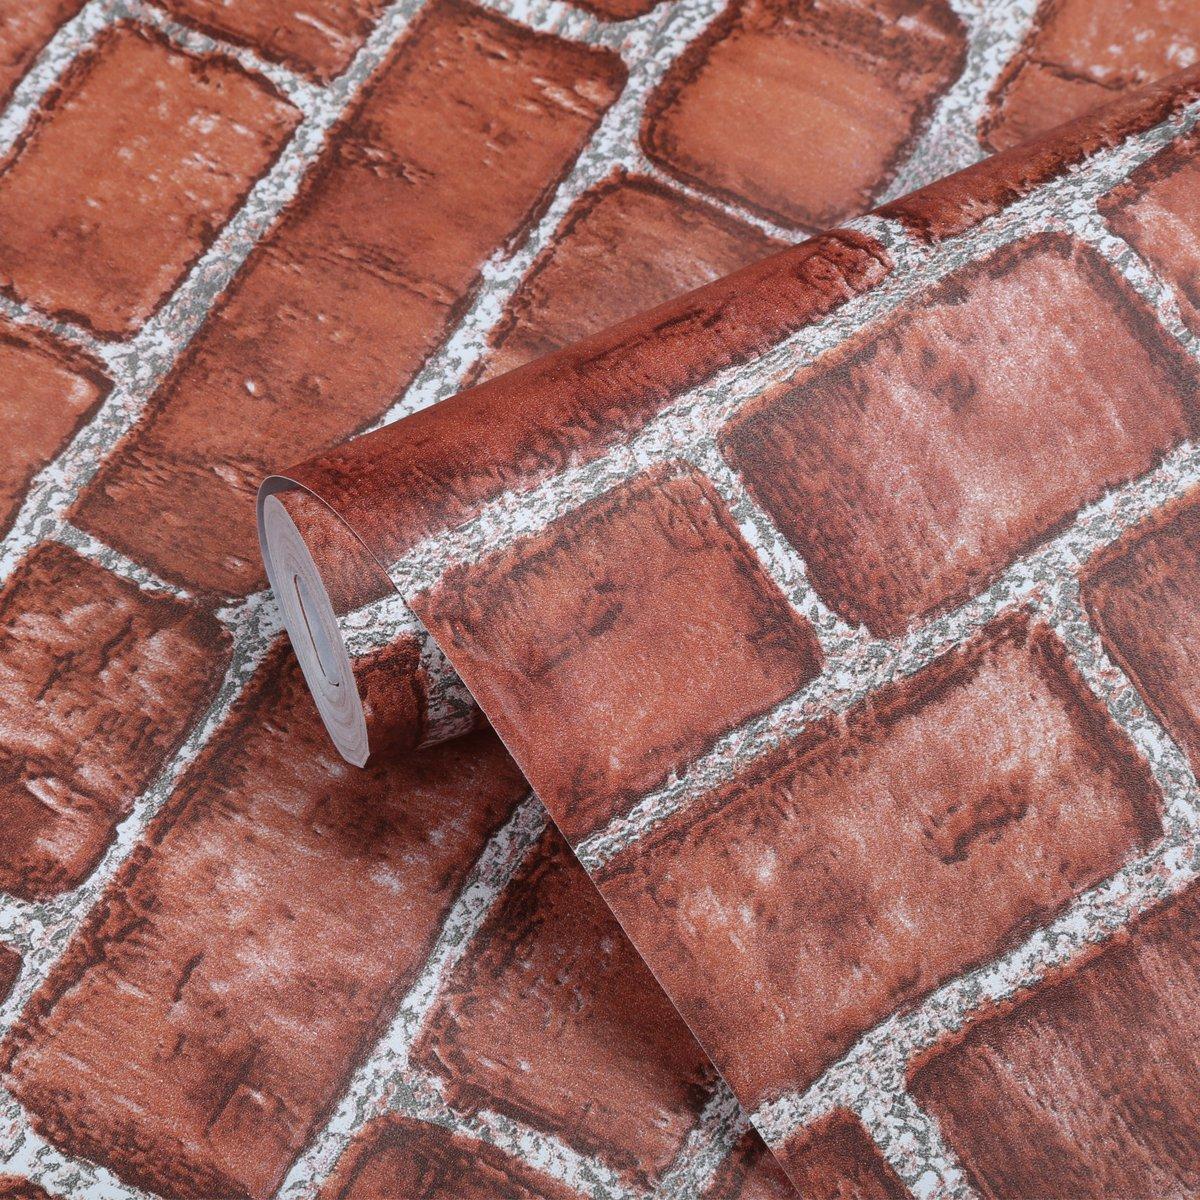 Coavas Decorative Self-Adhesive Wallpaper Red Brick Printed Stick Paper Easy to Apply Peel Stick Wallpaper (17.7x196.9 inch)